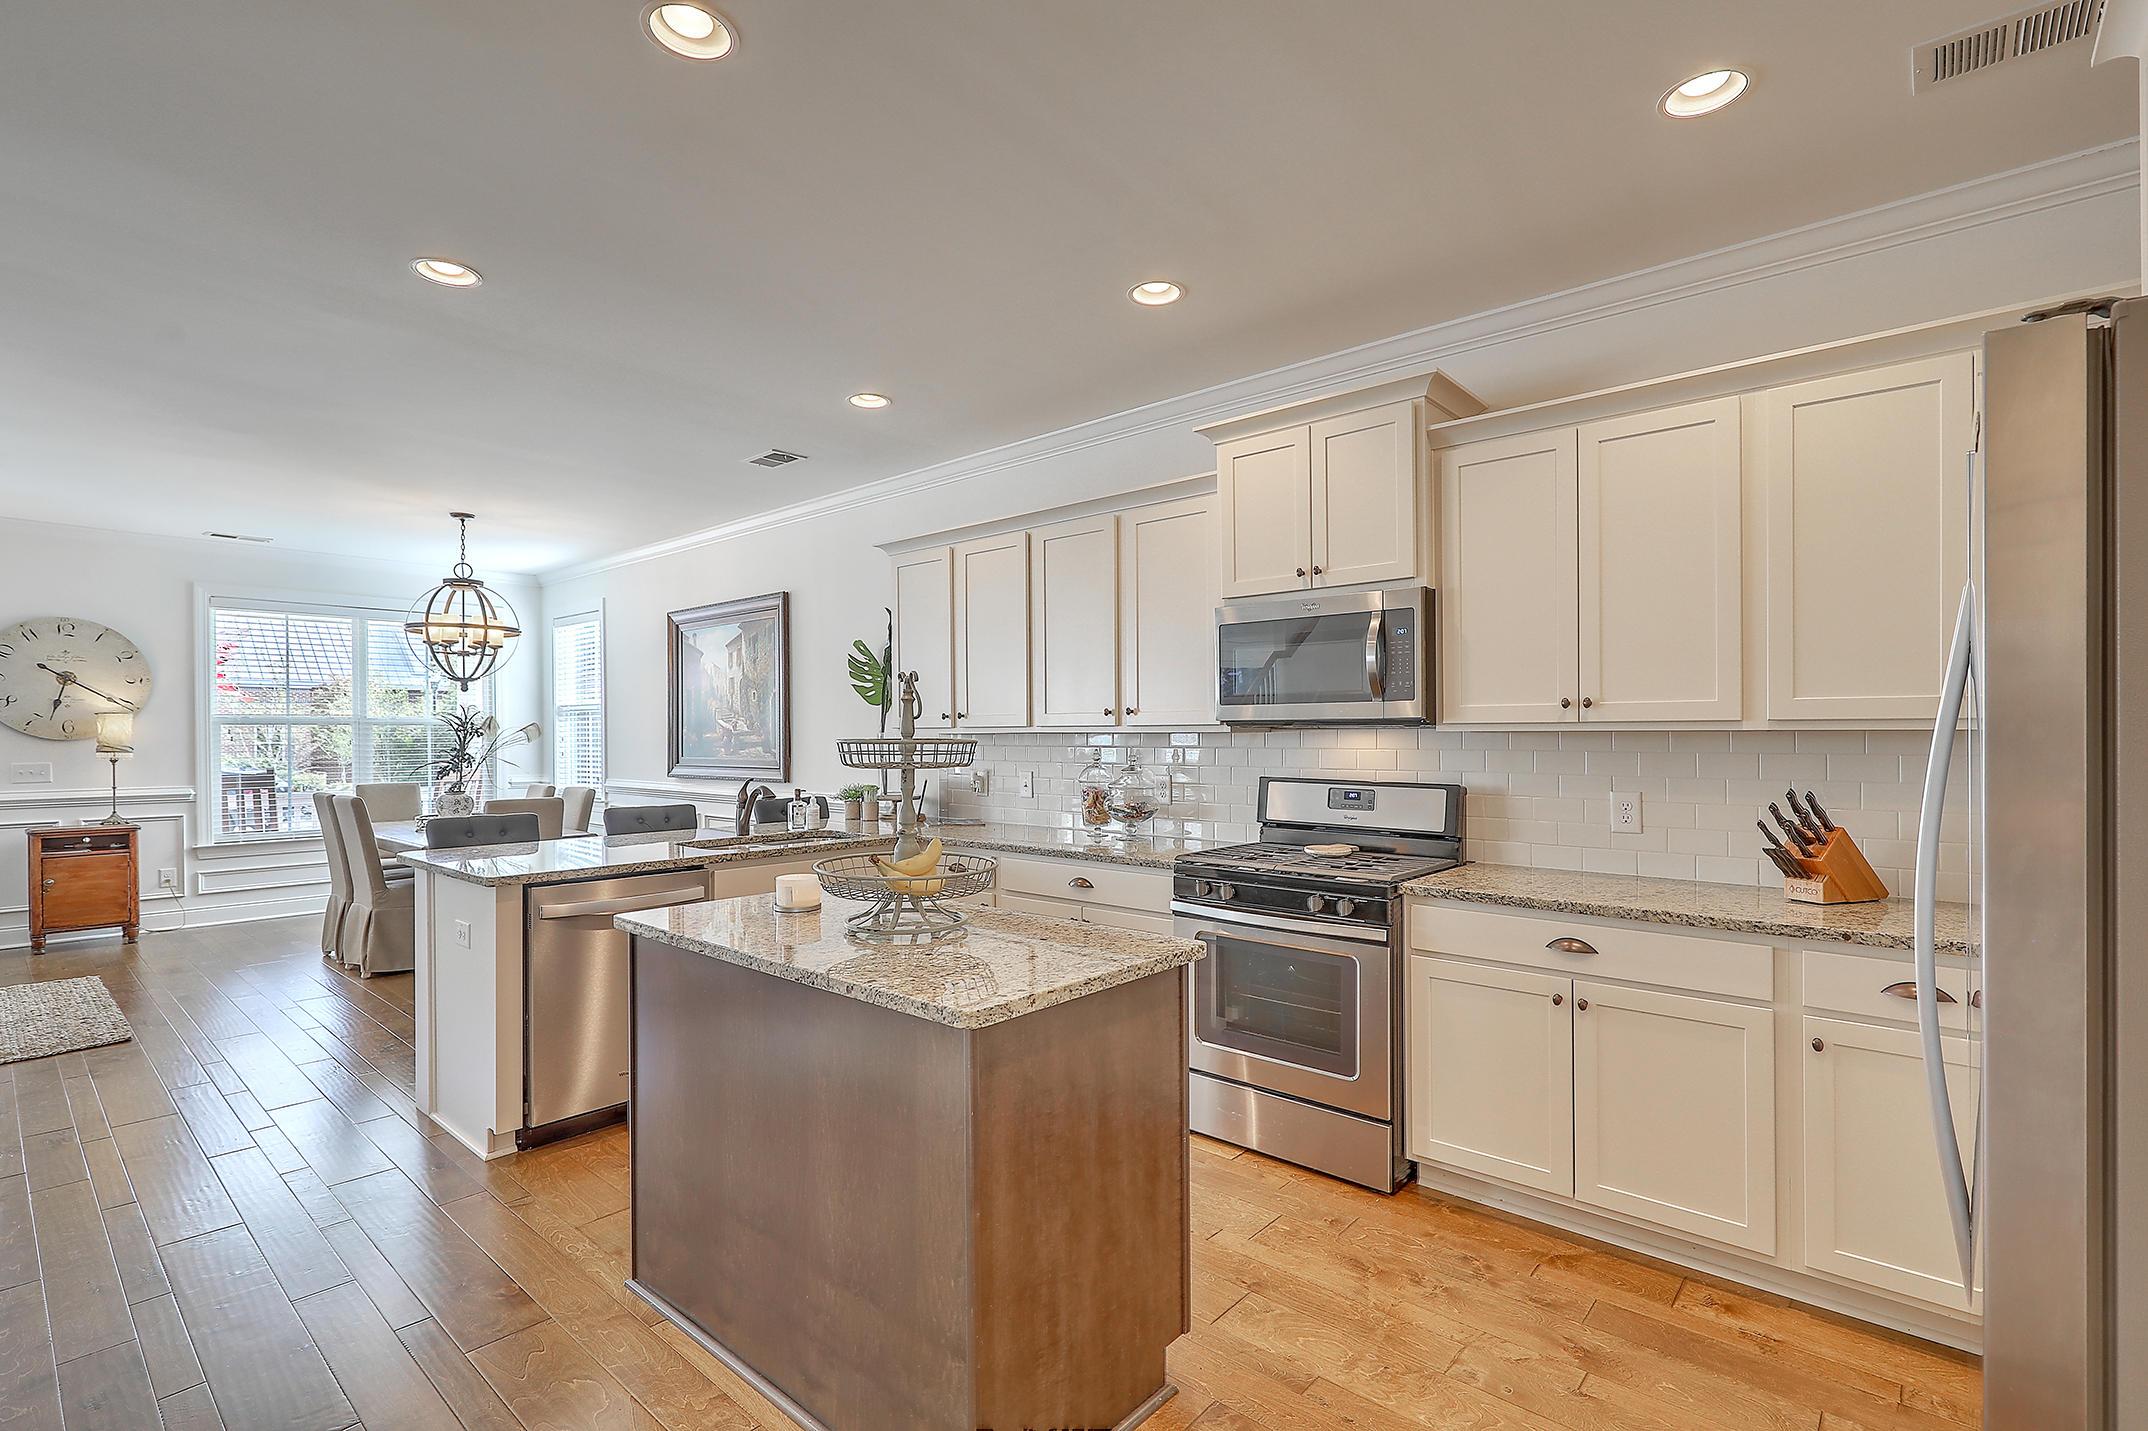 Park West Homes For Sale - 3412 Salterbeck, Mount Pleasant, SC - 11